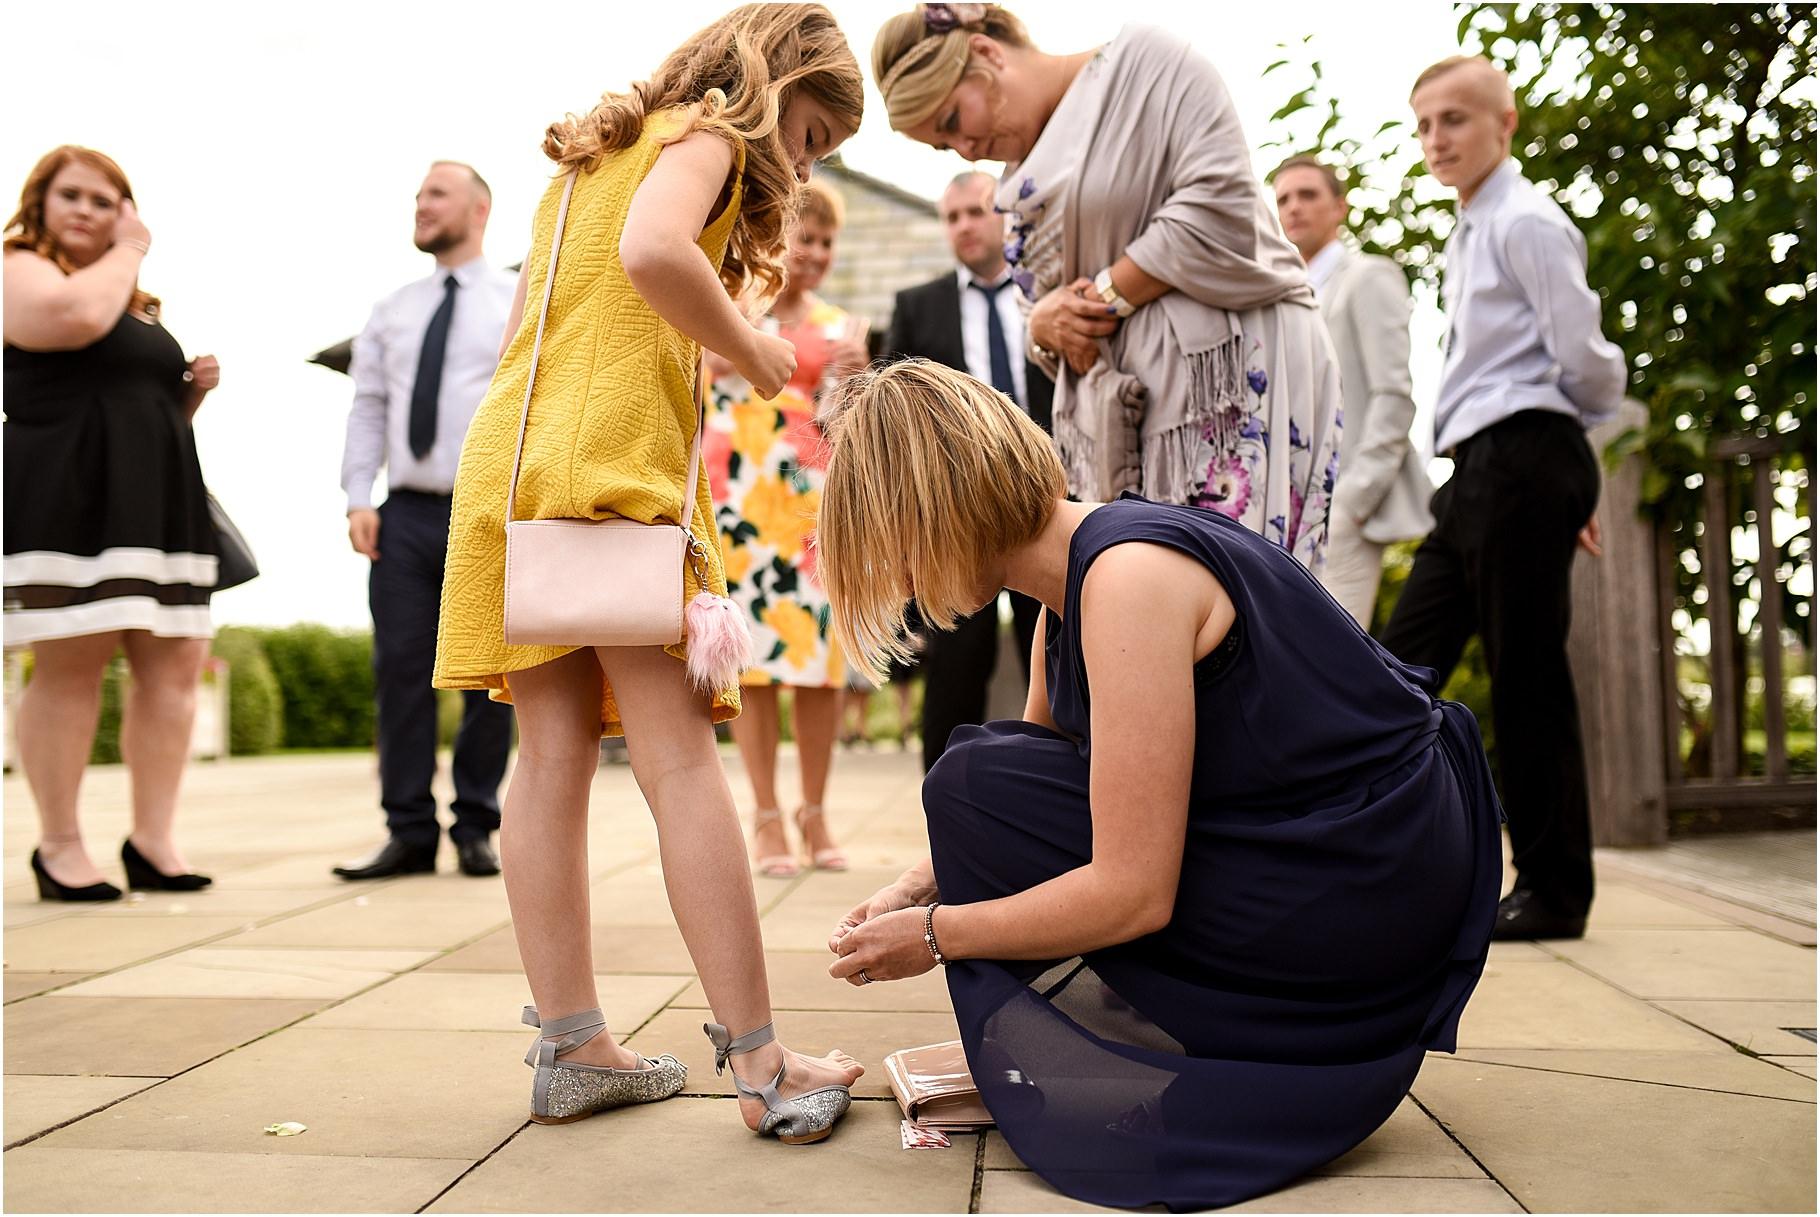 dan-wootton-photography-2017-weddings-163.jpg